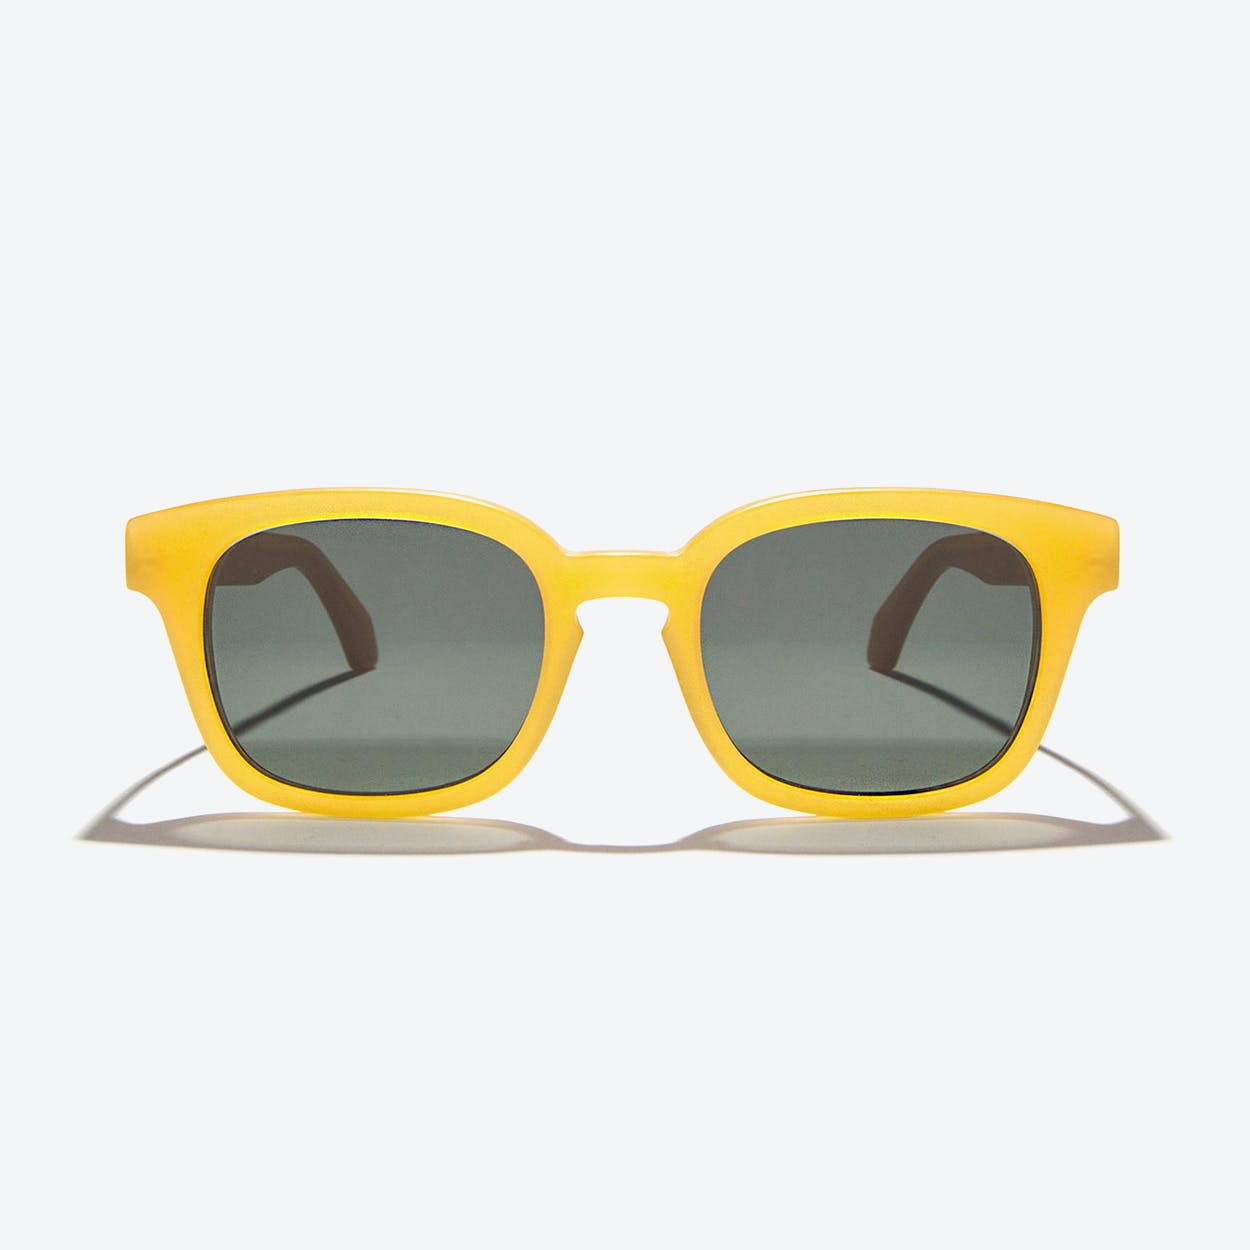 Minos Sunglasses in Yellow